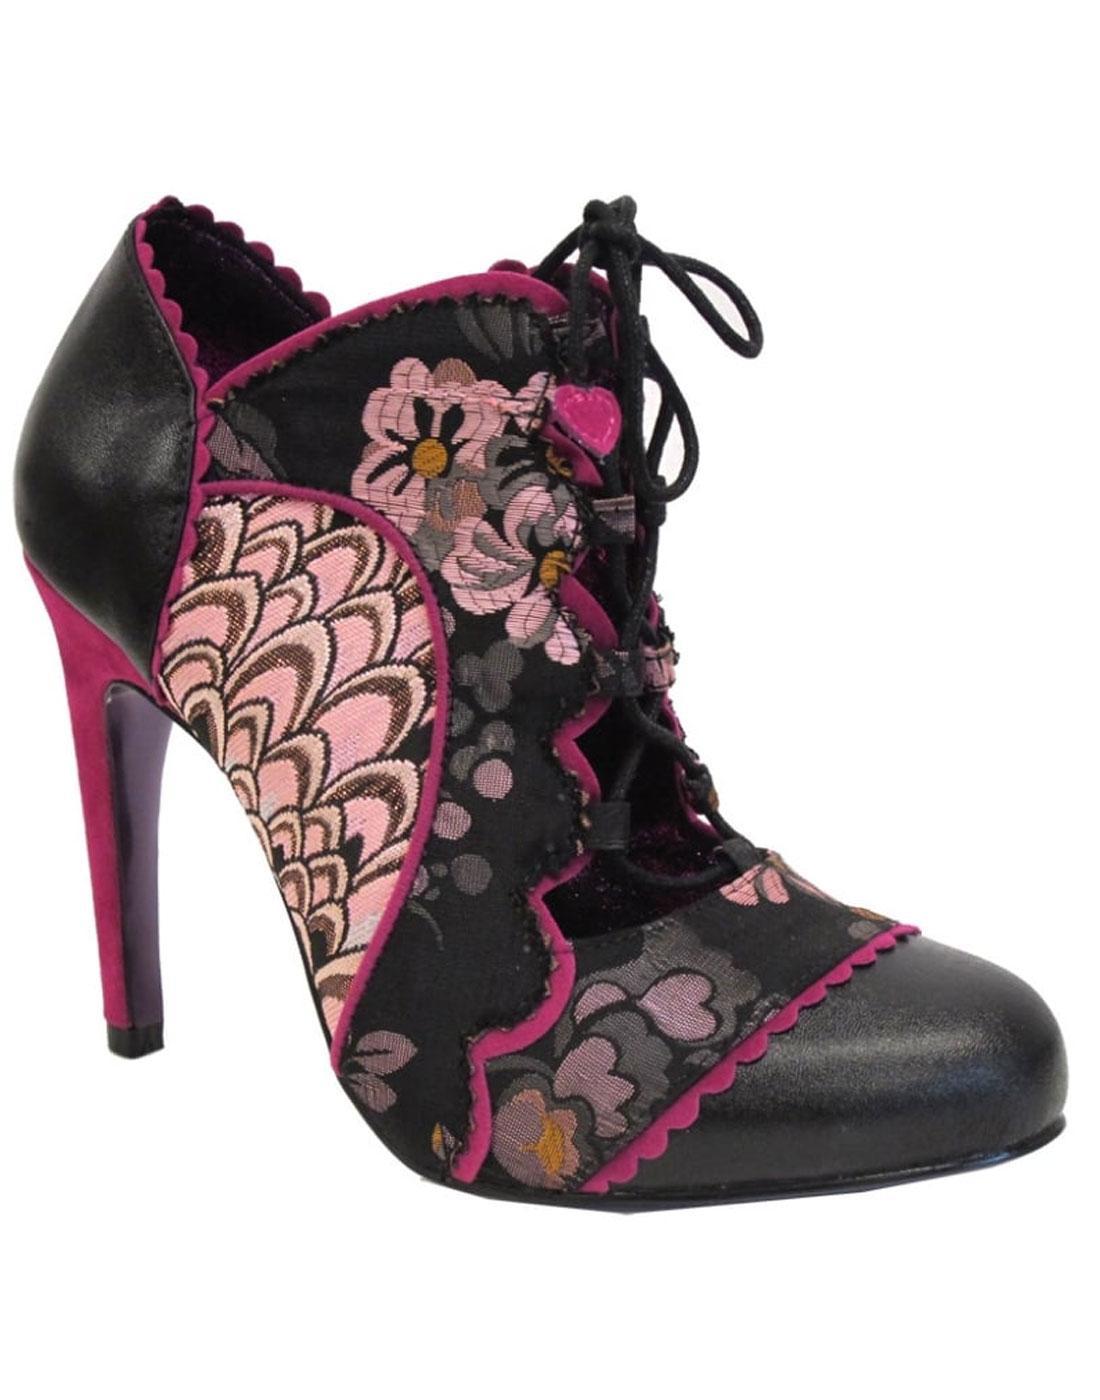 Halston POETIC LICENCE Open Front Floral Heels (P)